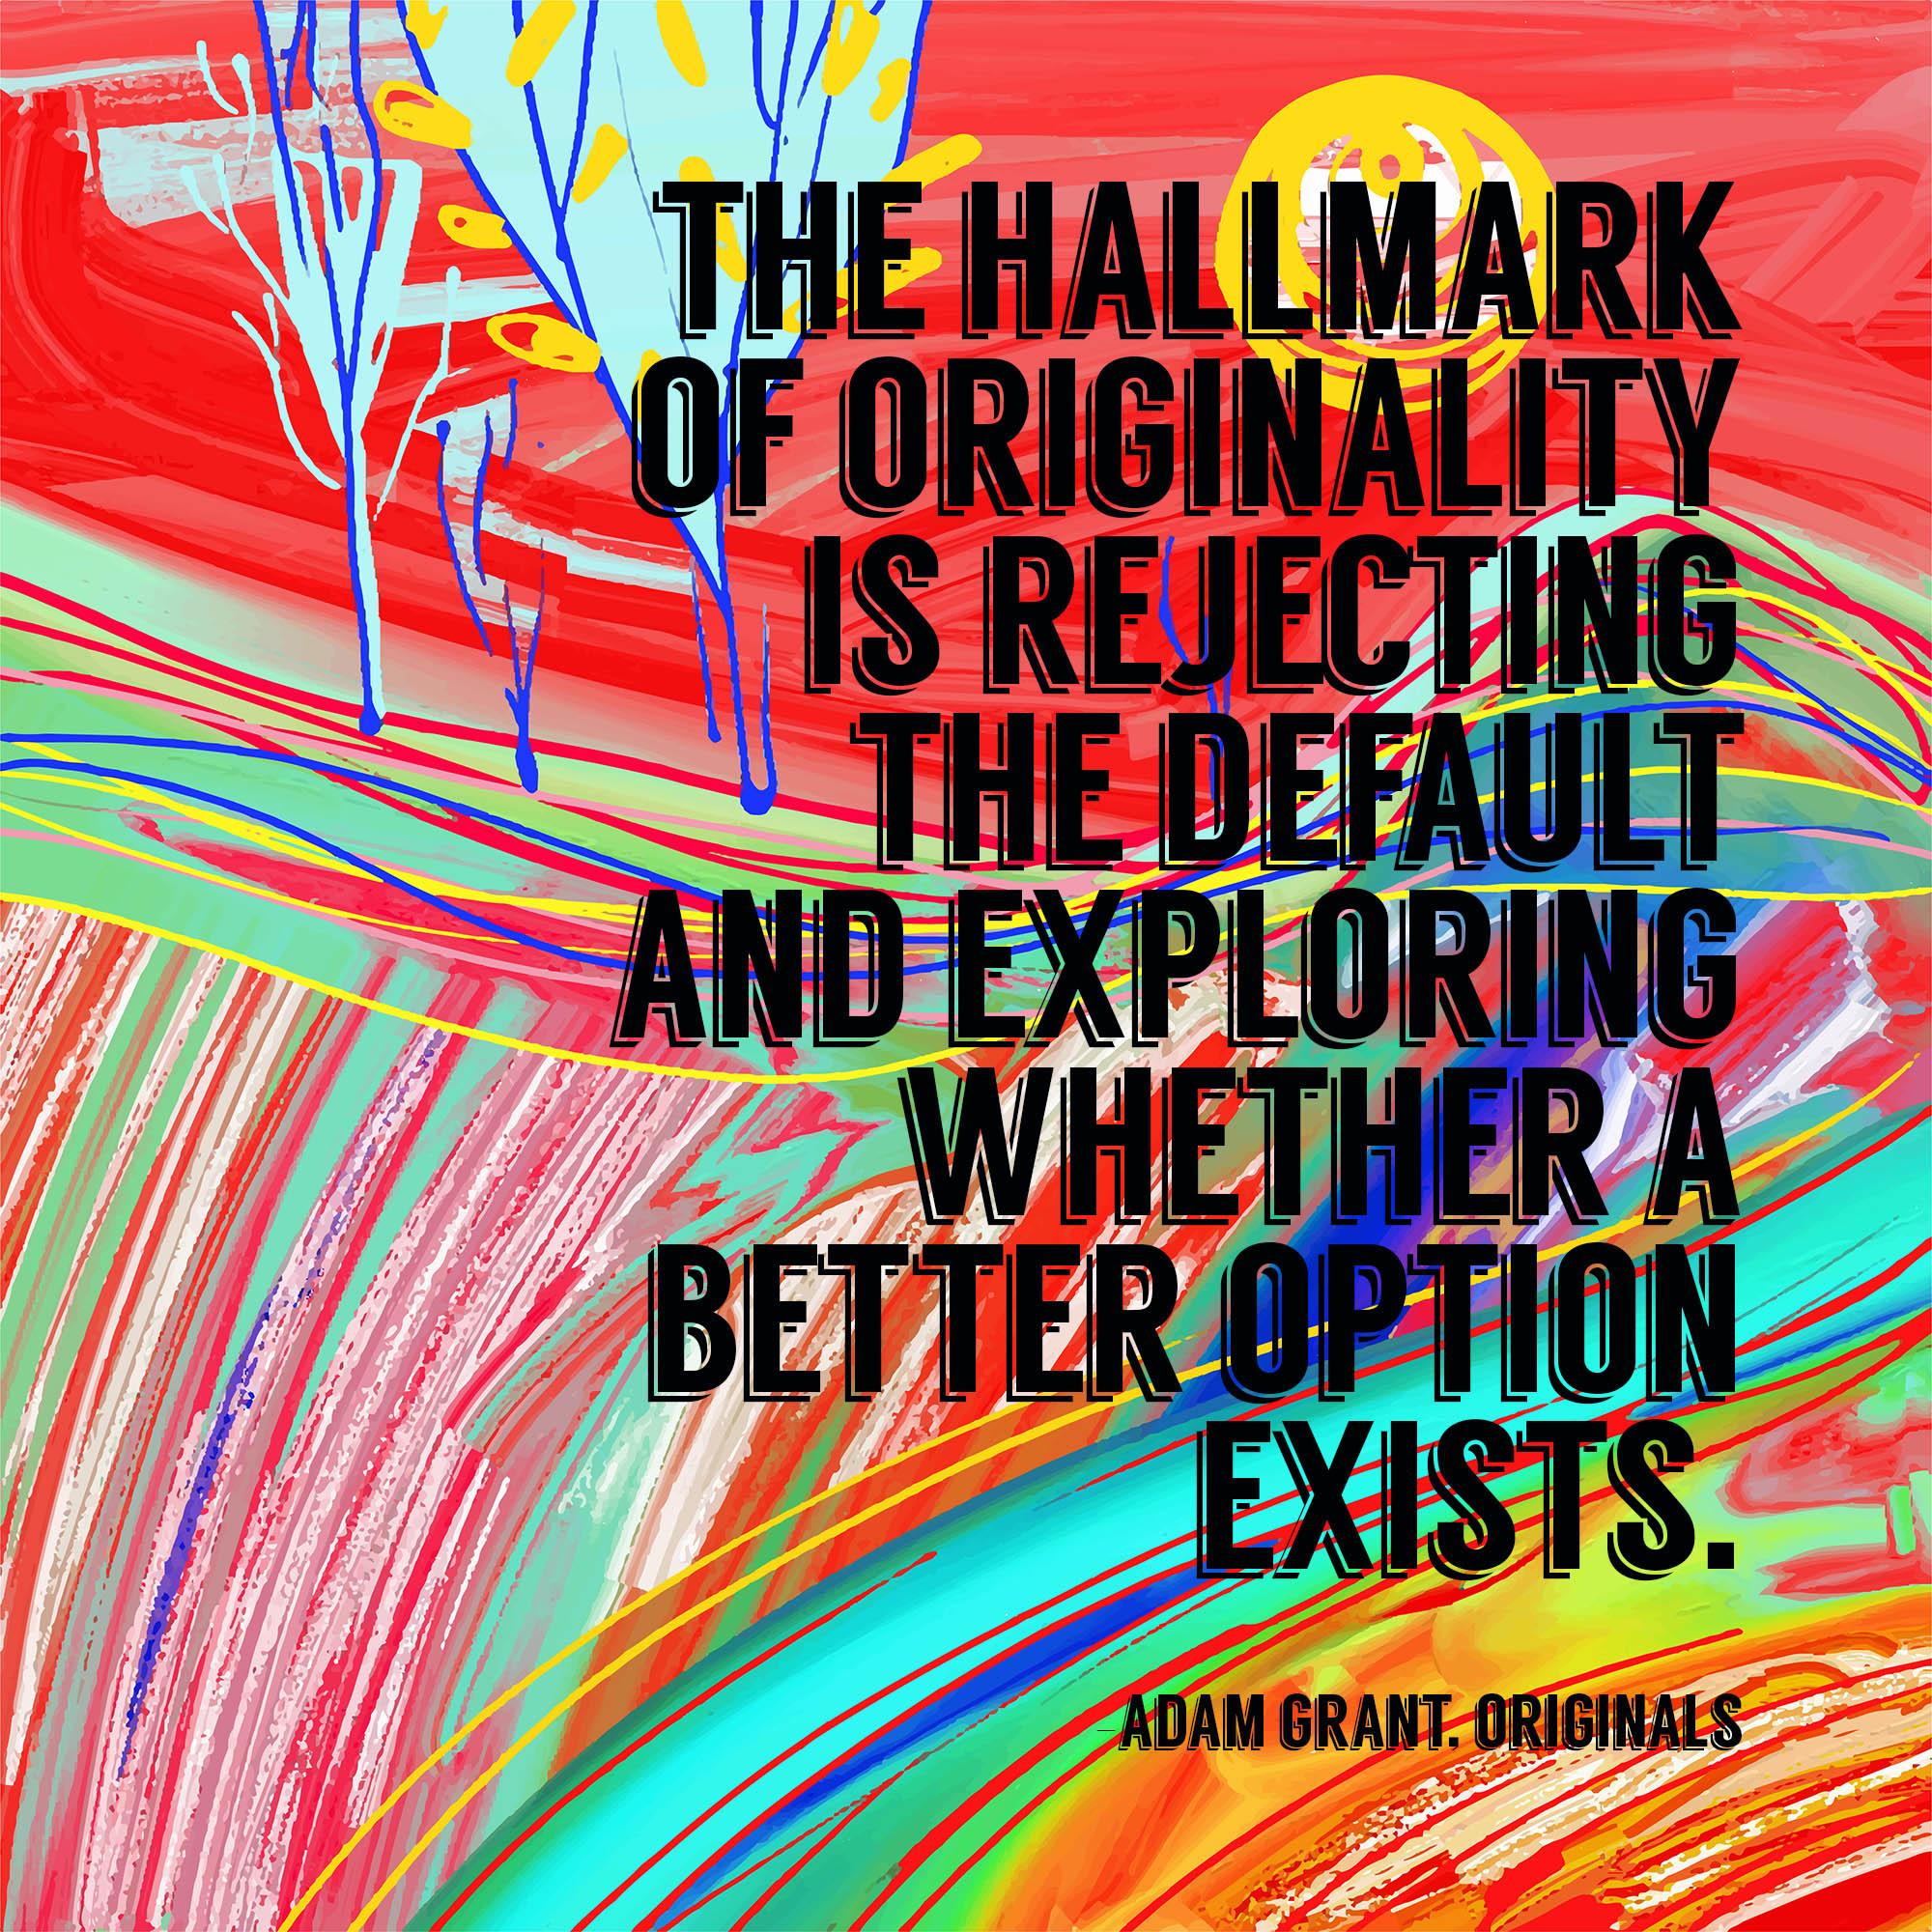 The Hallmark of Originality